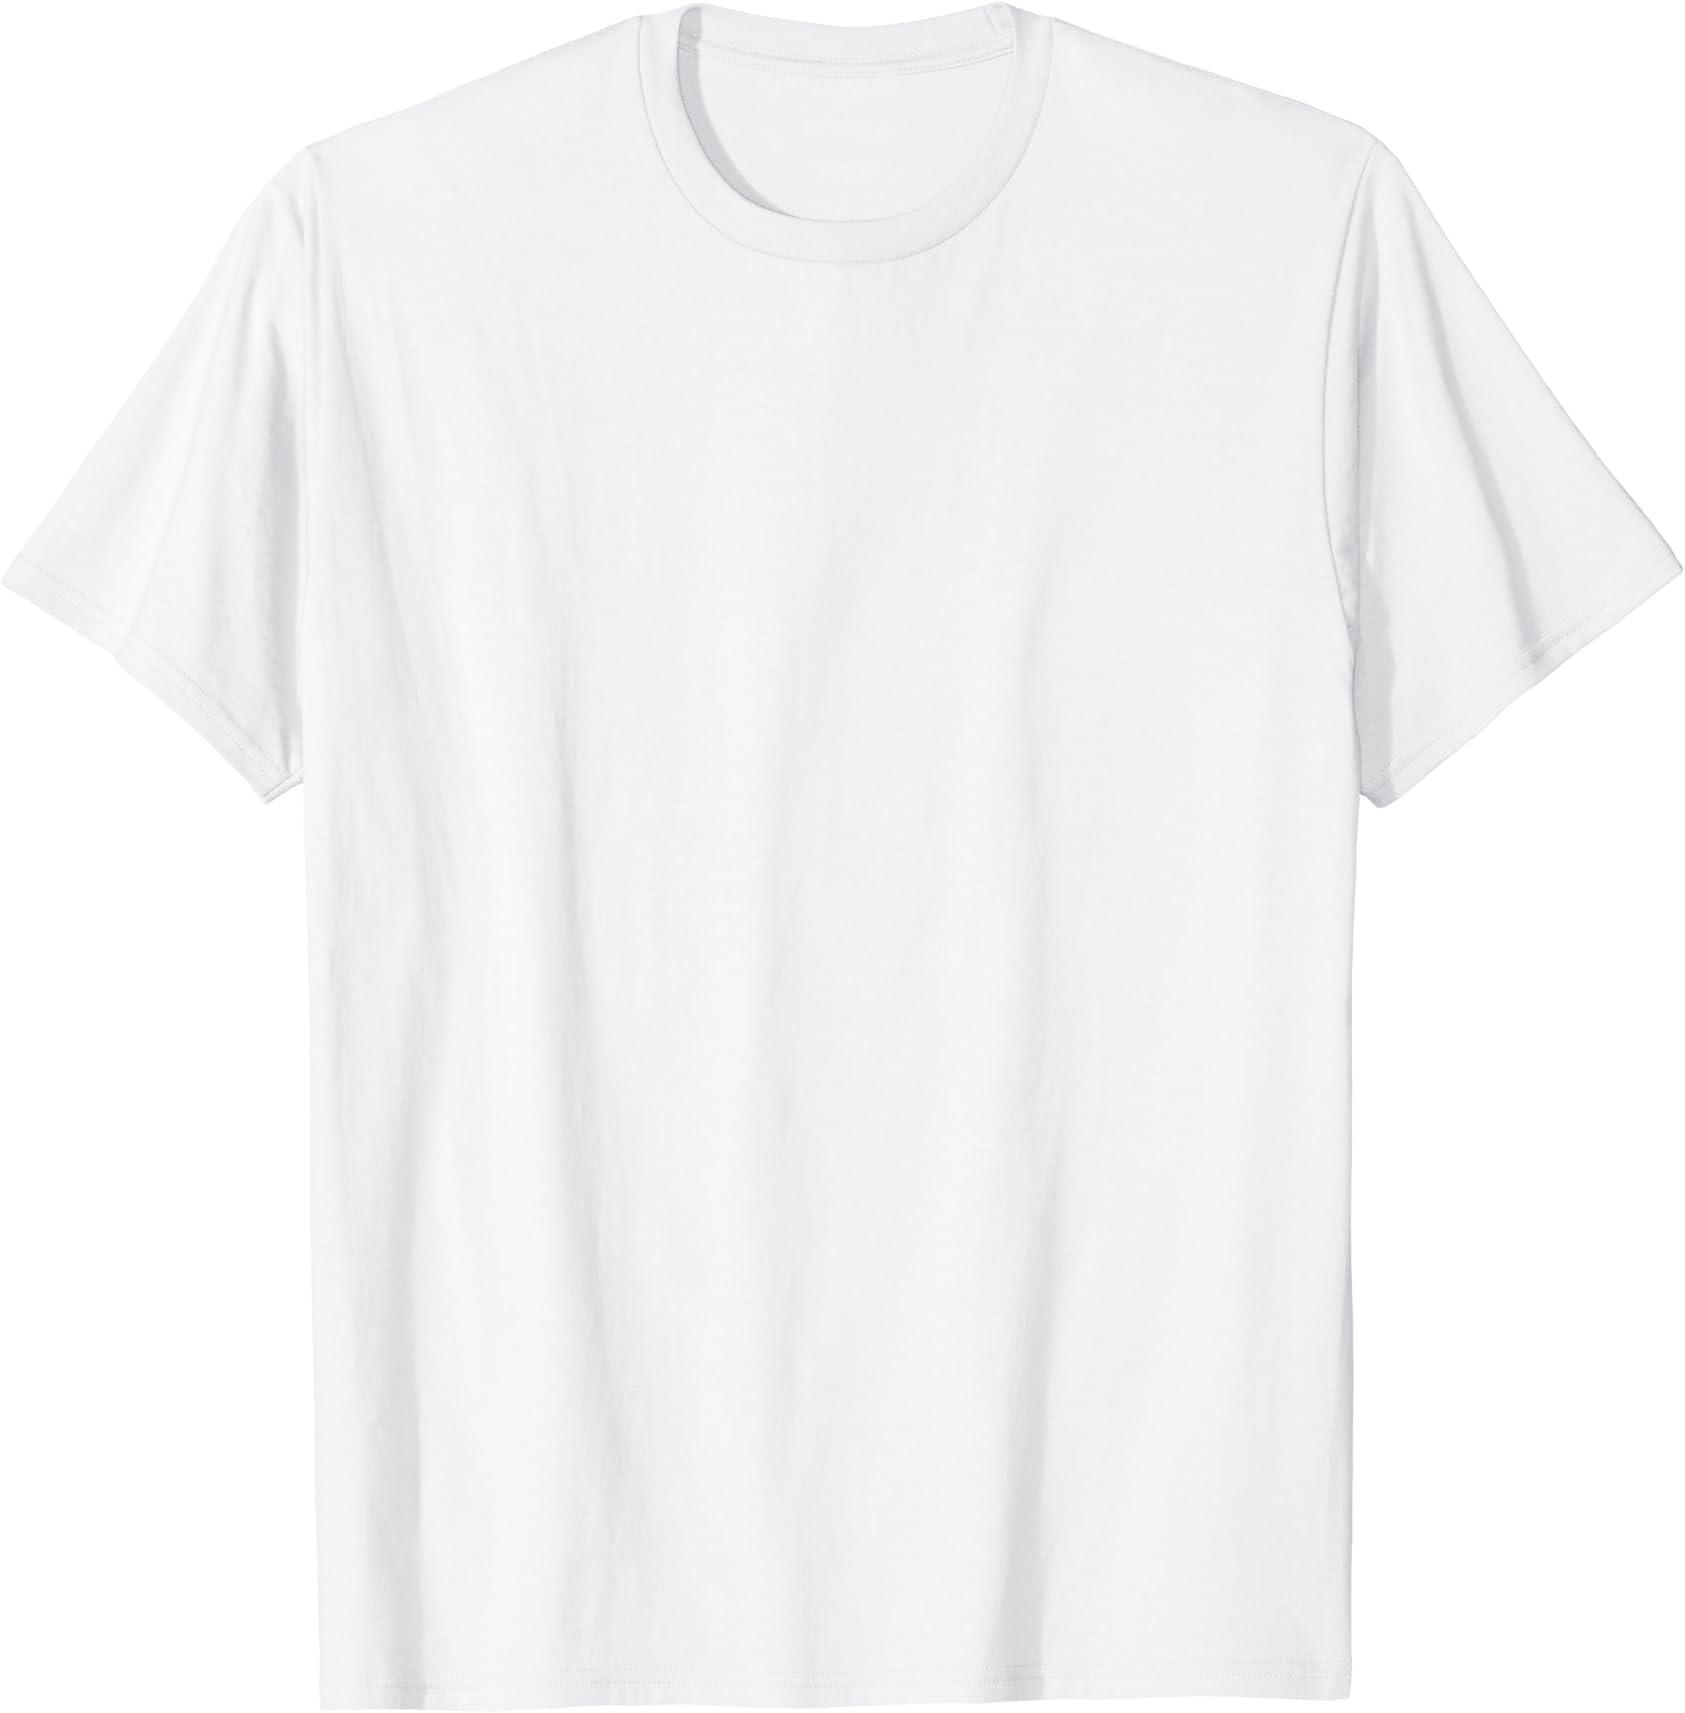 Washing Machine I/'m A Boy T-Shirt Tee Womens Unisex Pregnancy  Anouncement